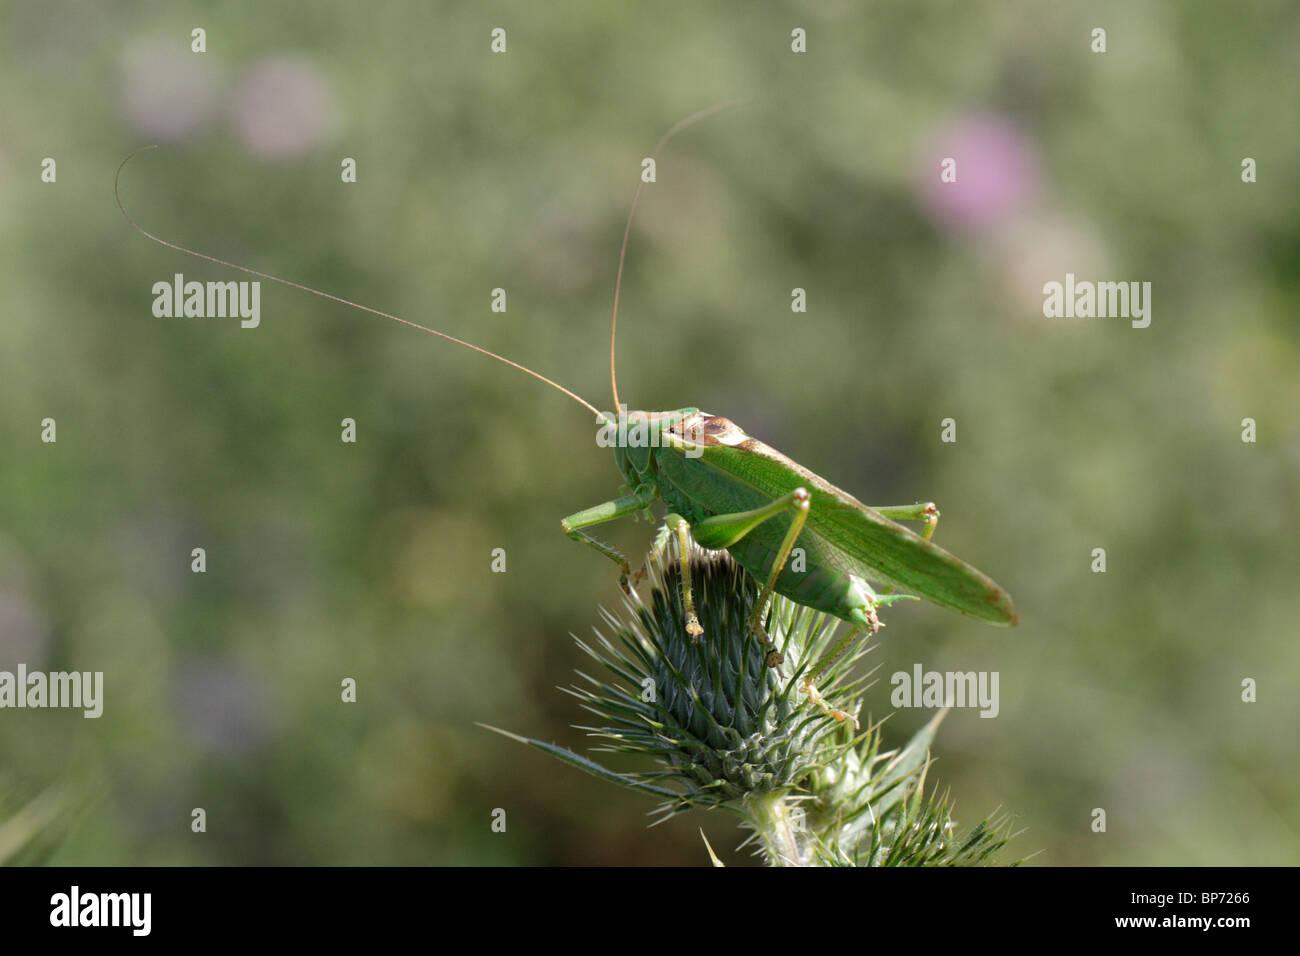 Tettigonia Viridissima, die große grüne Bush-cricket Stockbild